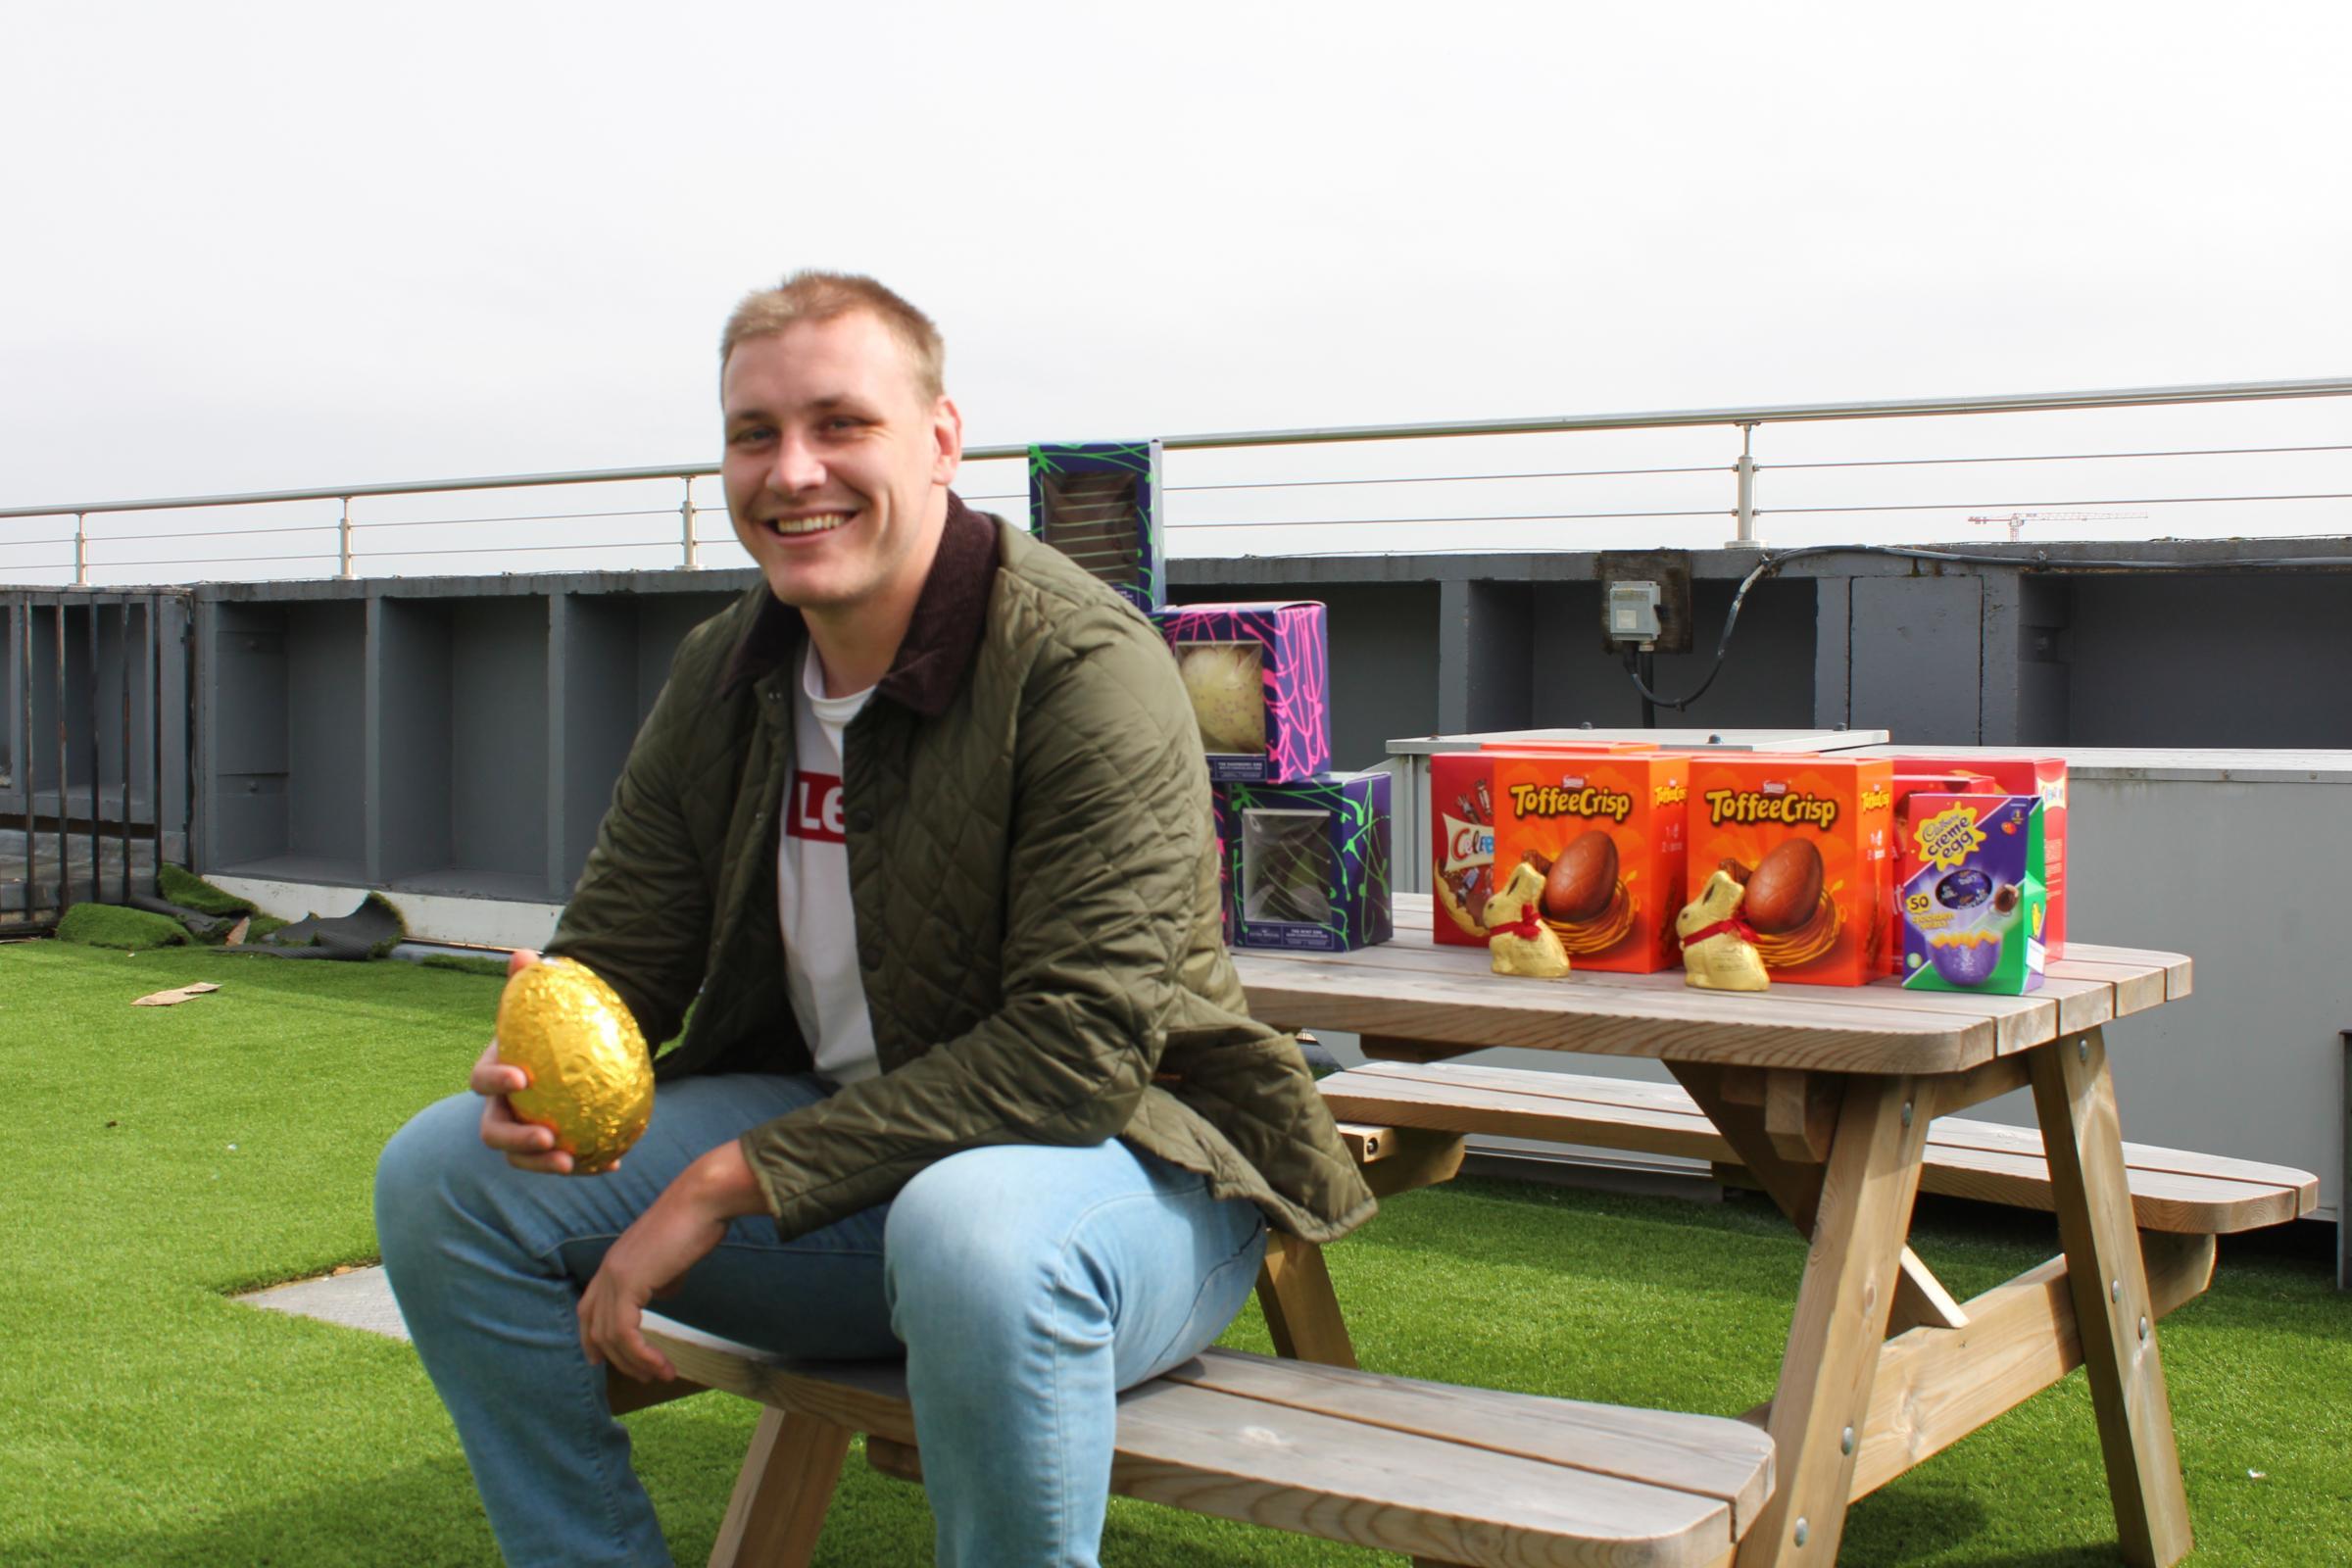 Joe Batley surprises Bristol hospital with Easter delivery